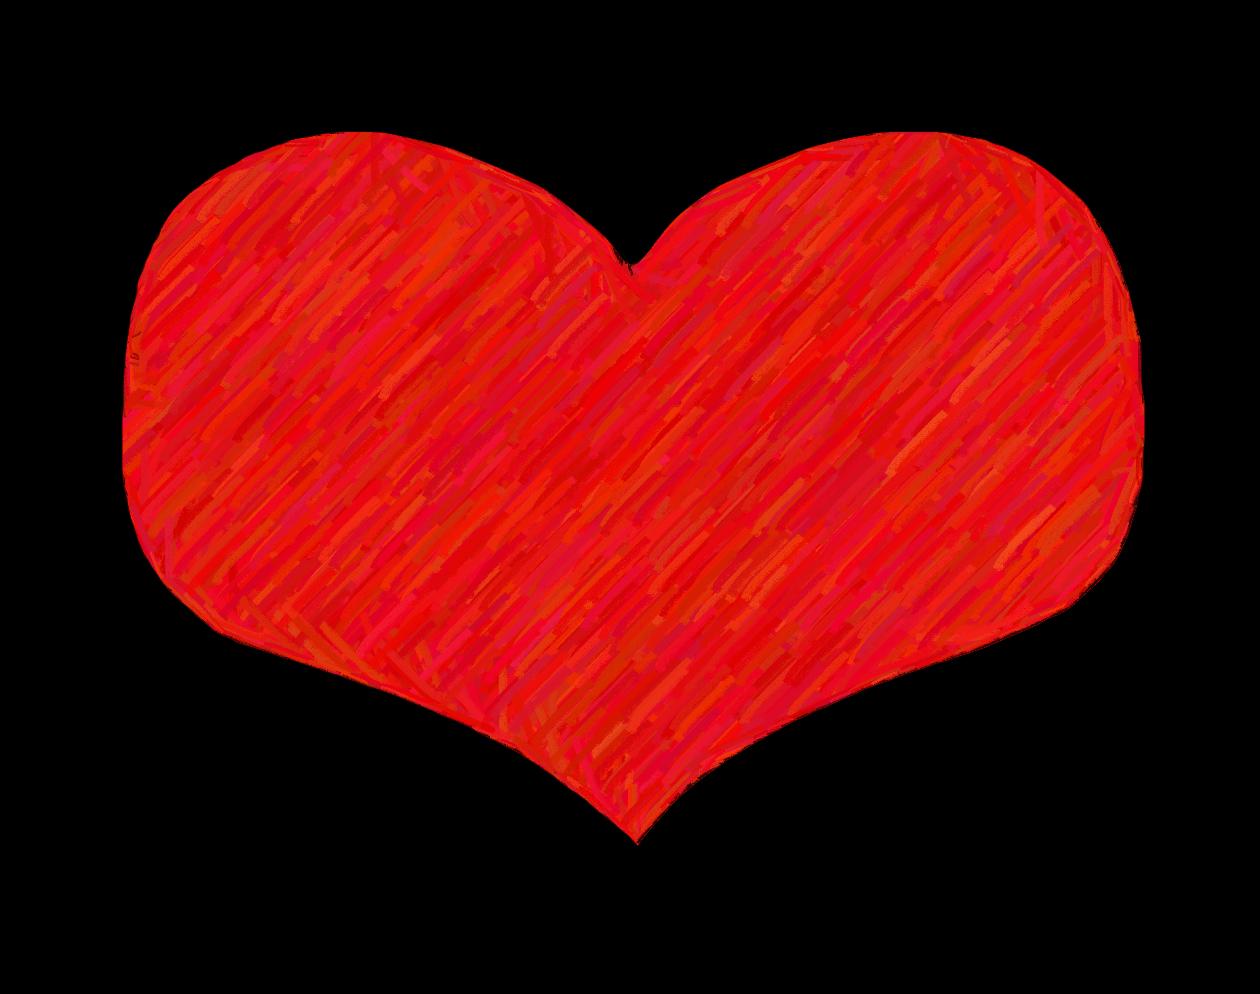 Hearts clip art images image 2